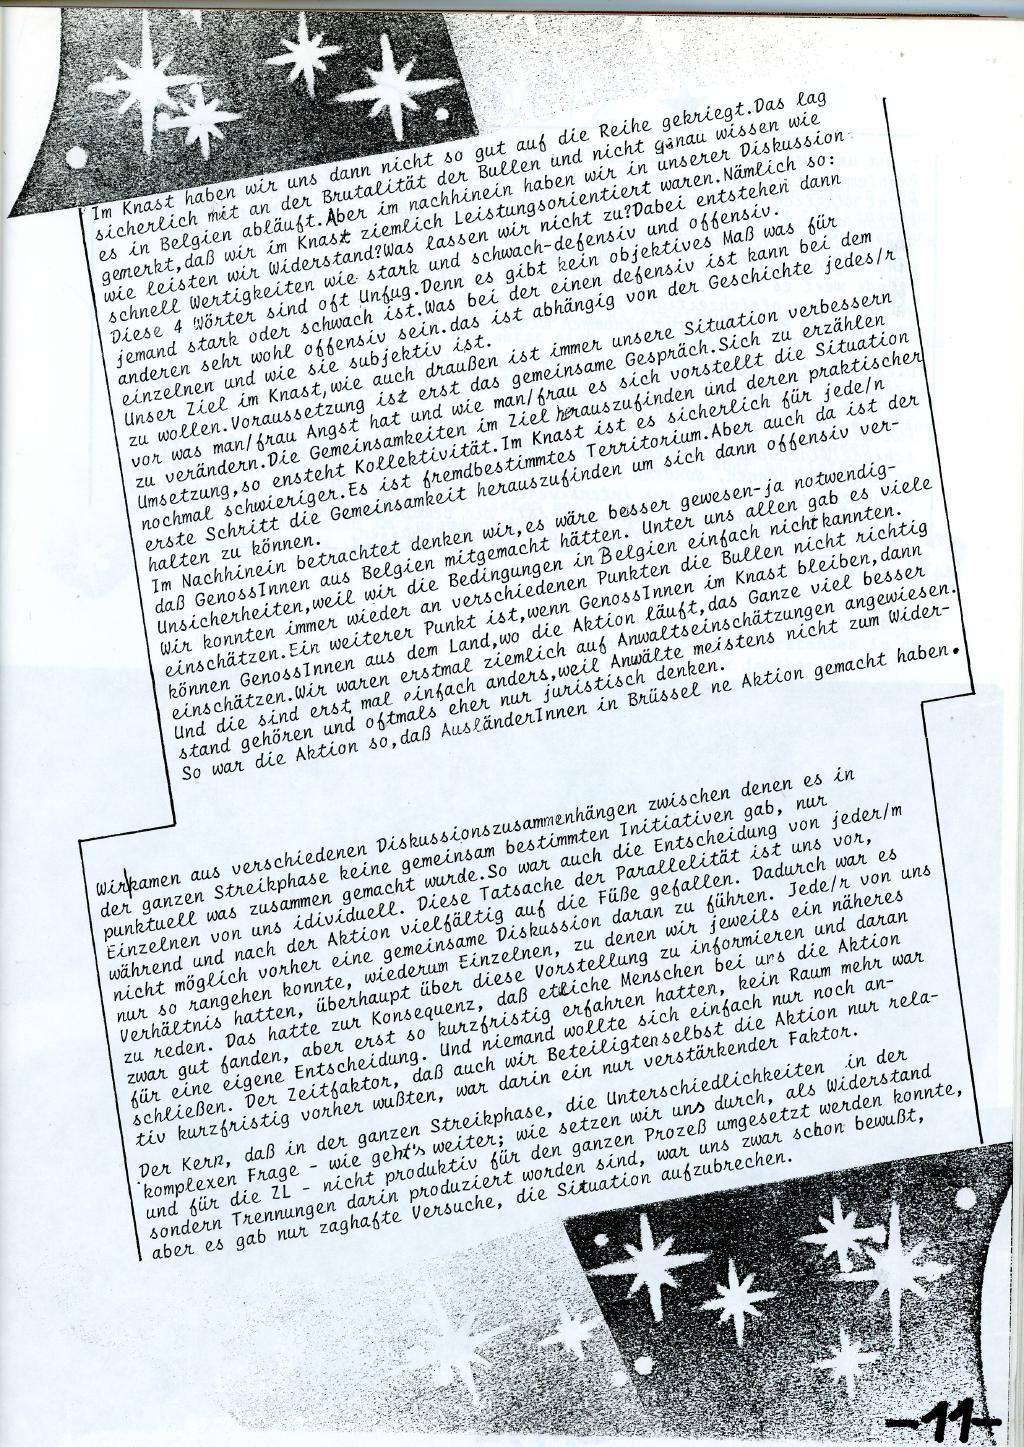 Belgien_Doku_Besetzung_EG_Kommission_1989_013